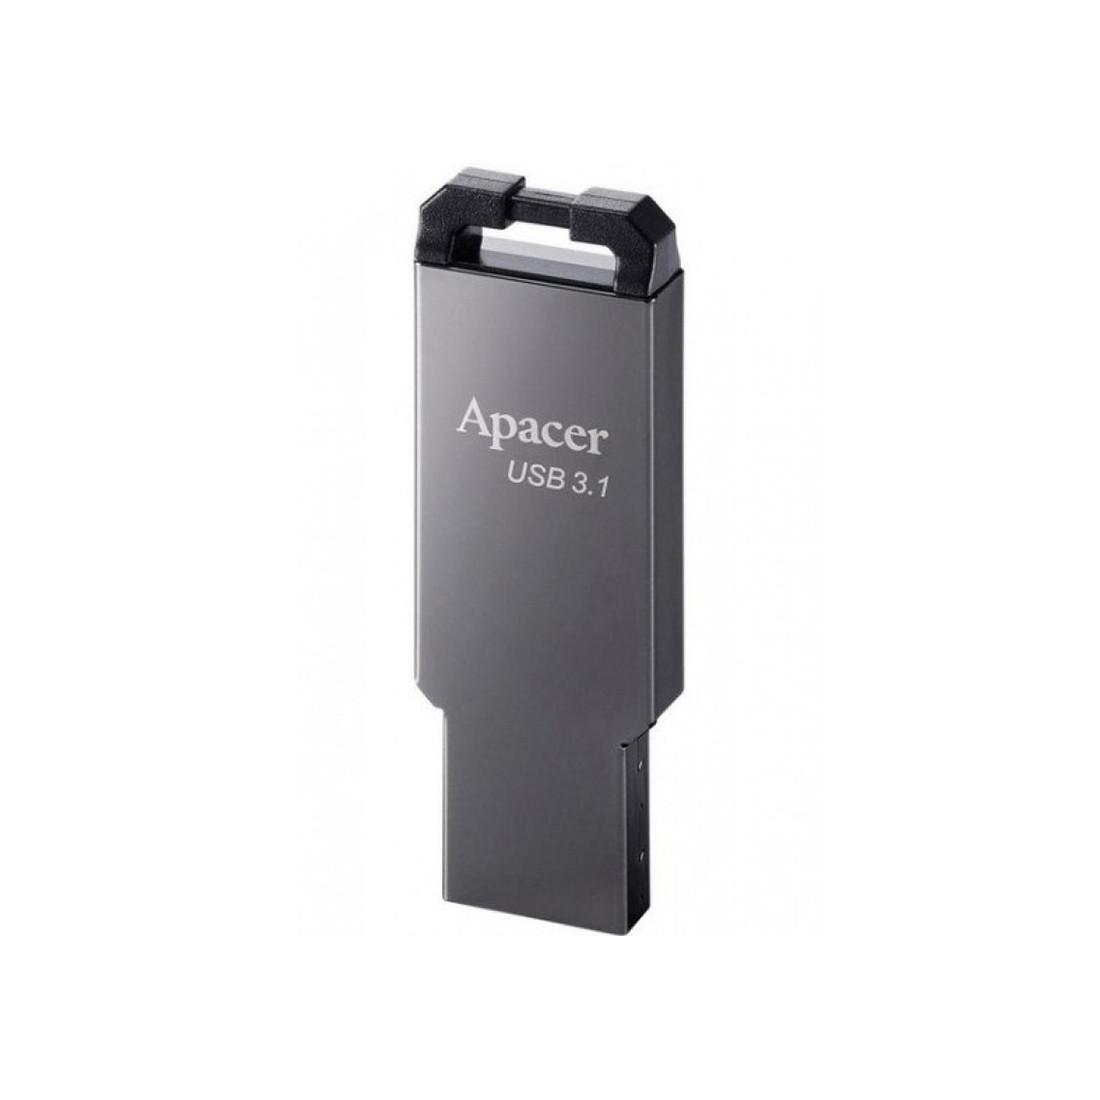 USB-накопитель  Apacer  AH360  AP16GAH360A-1  16GB  USB 3.1  Серый